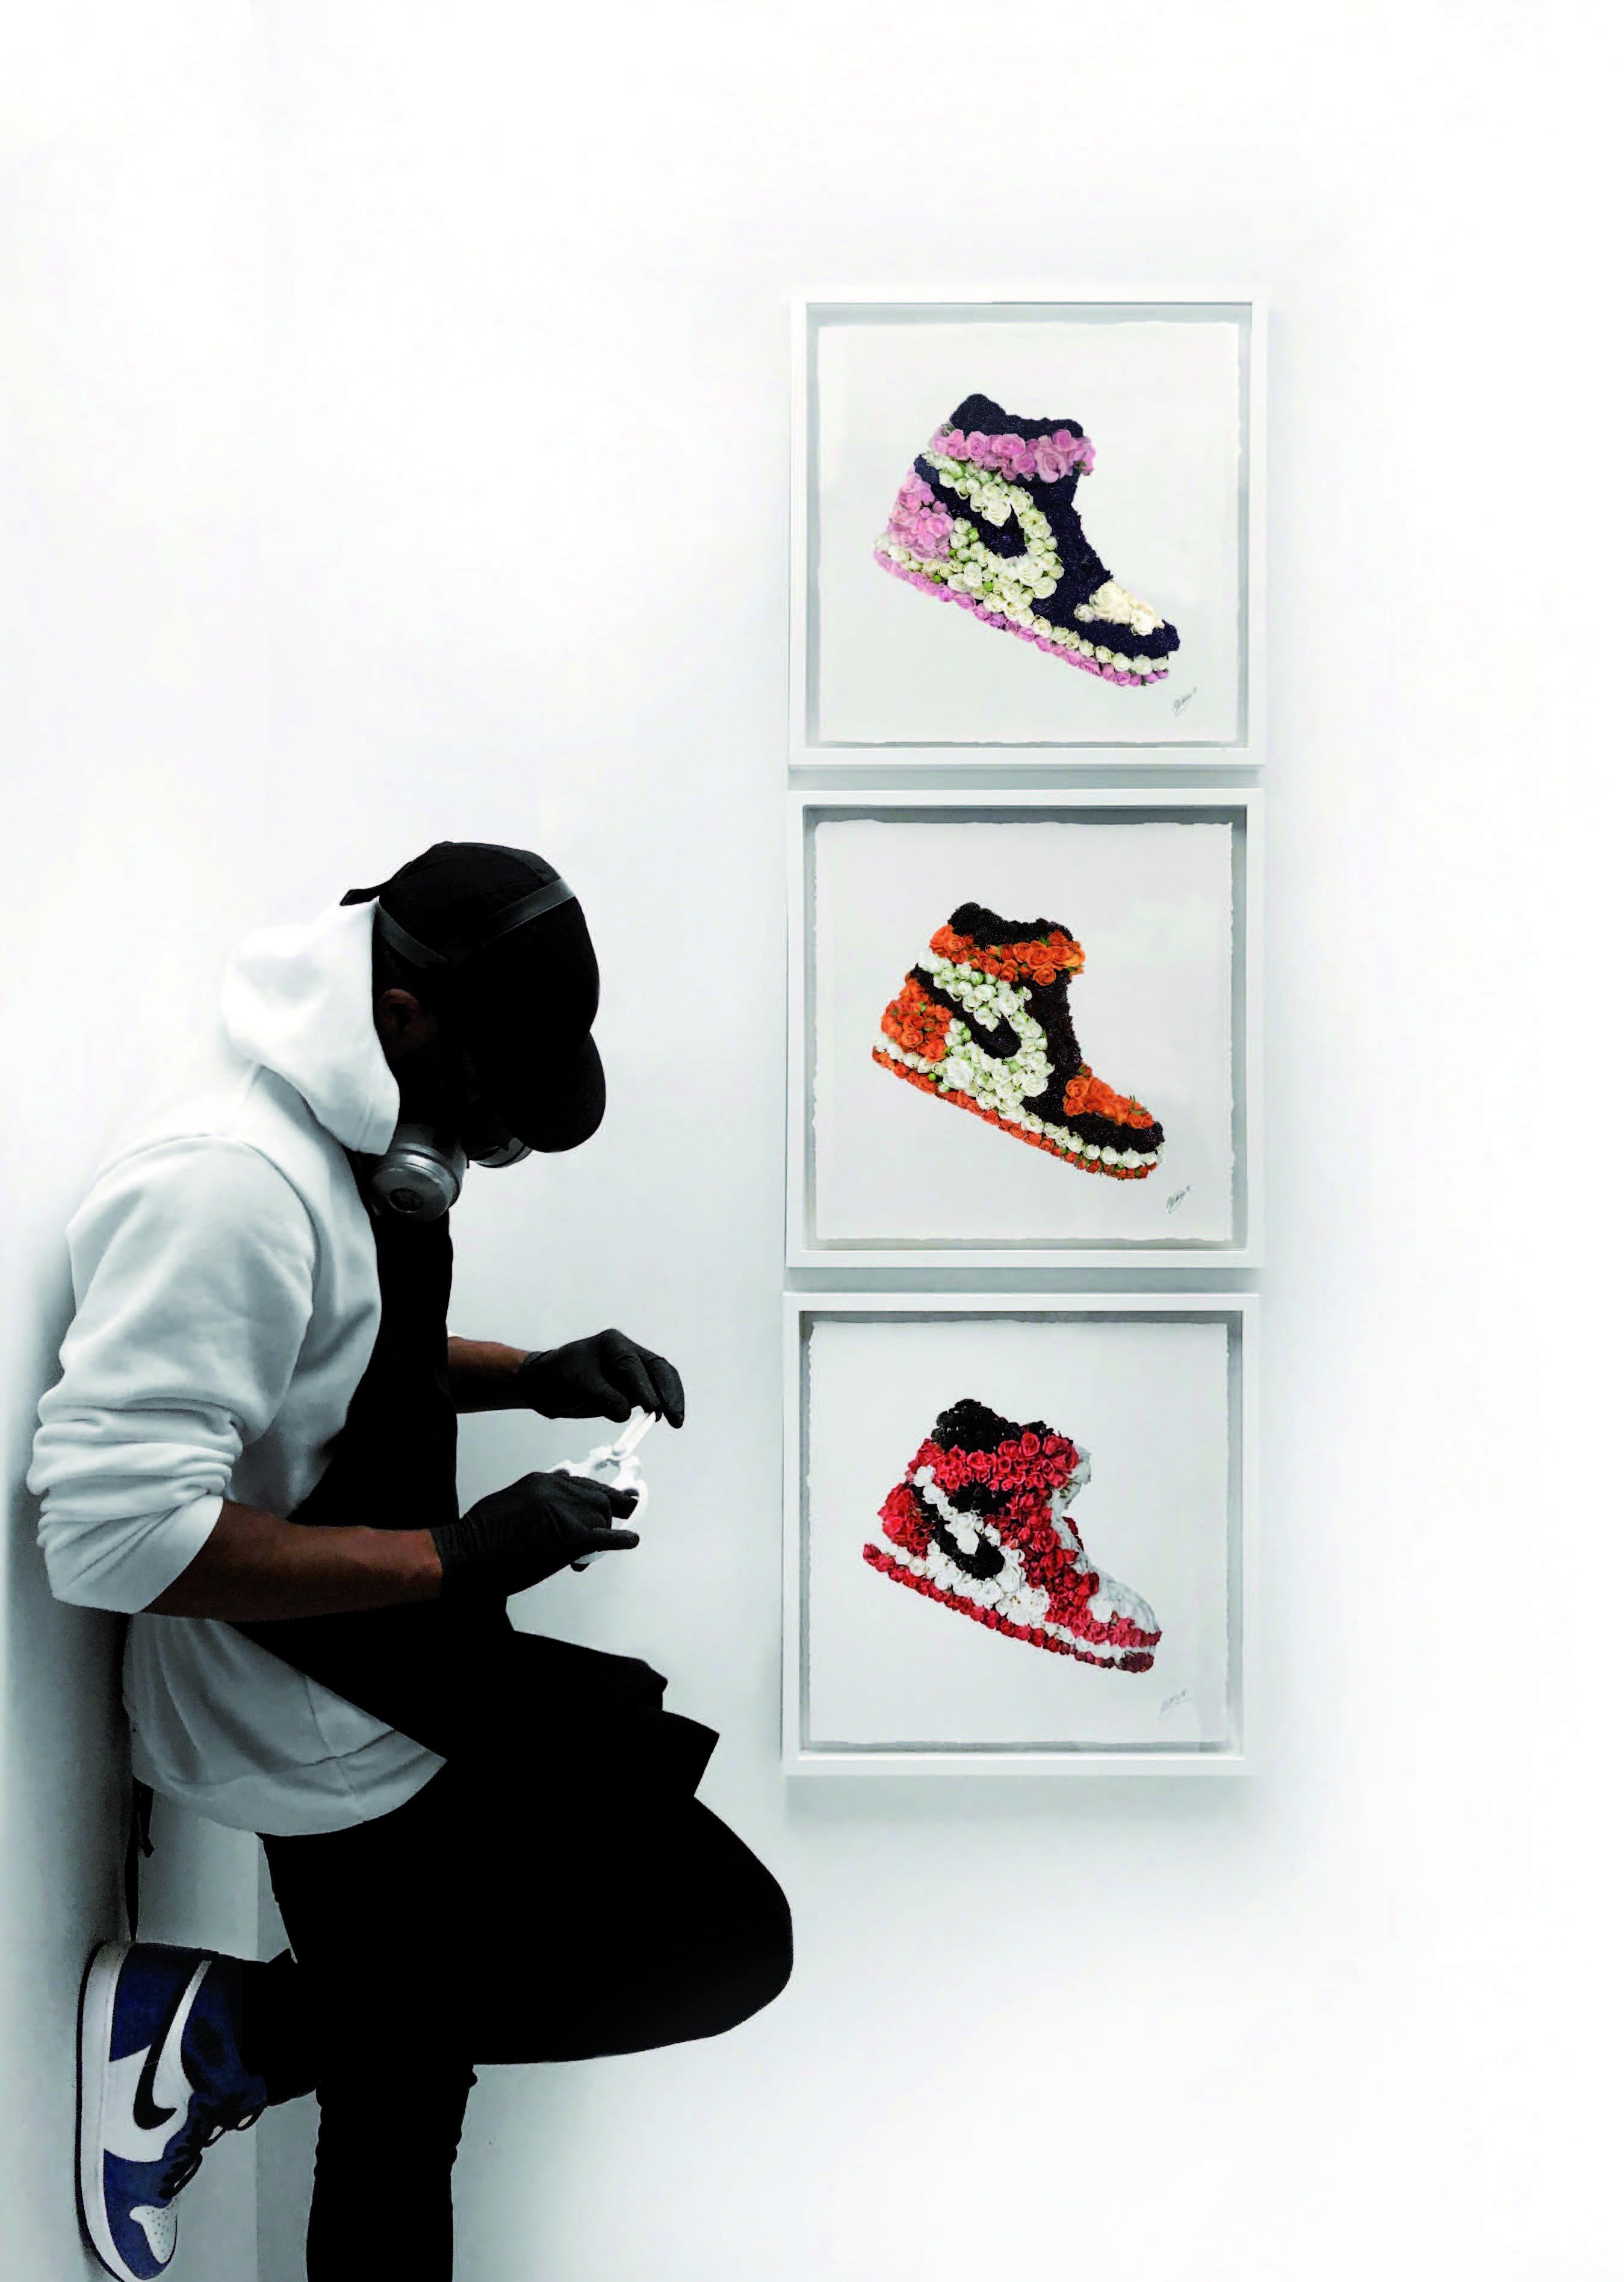 Mr Flower Fantastic - Sneakers Magazine